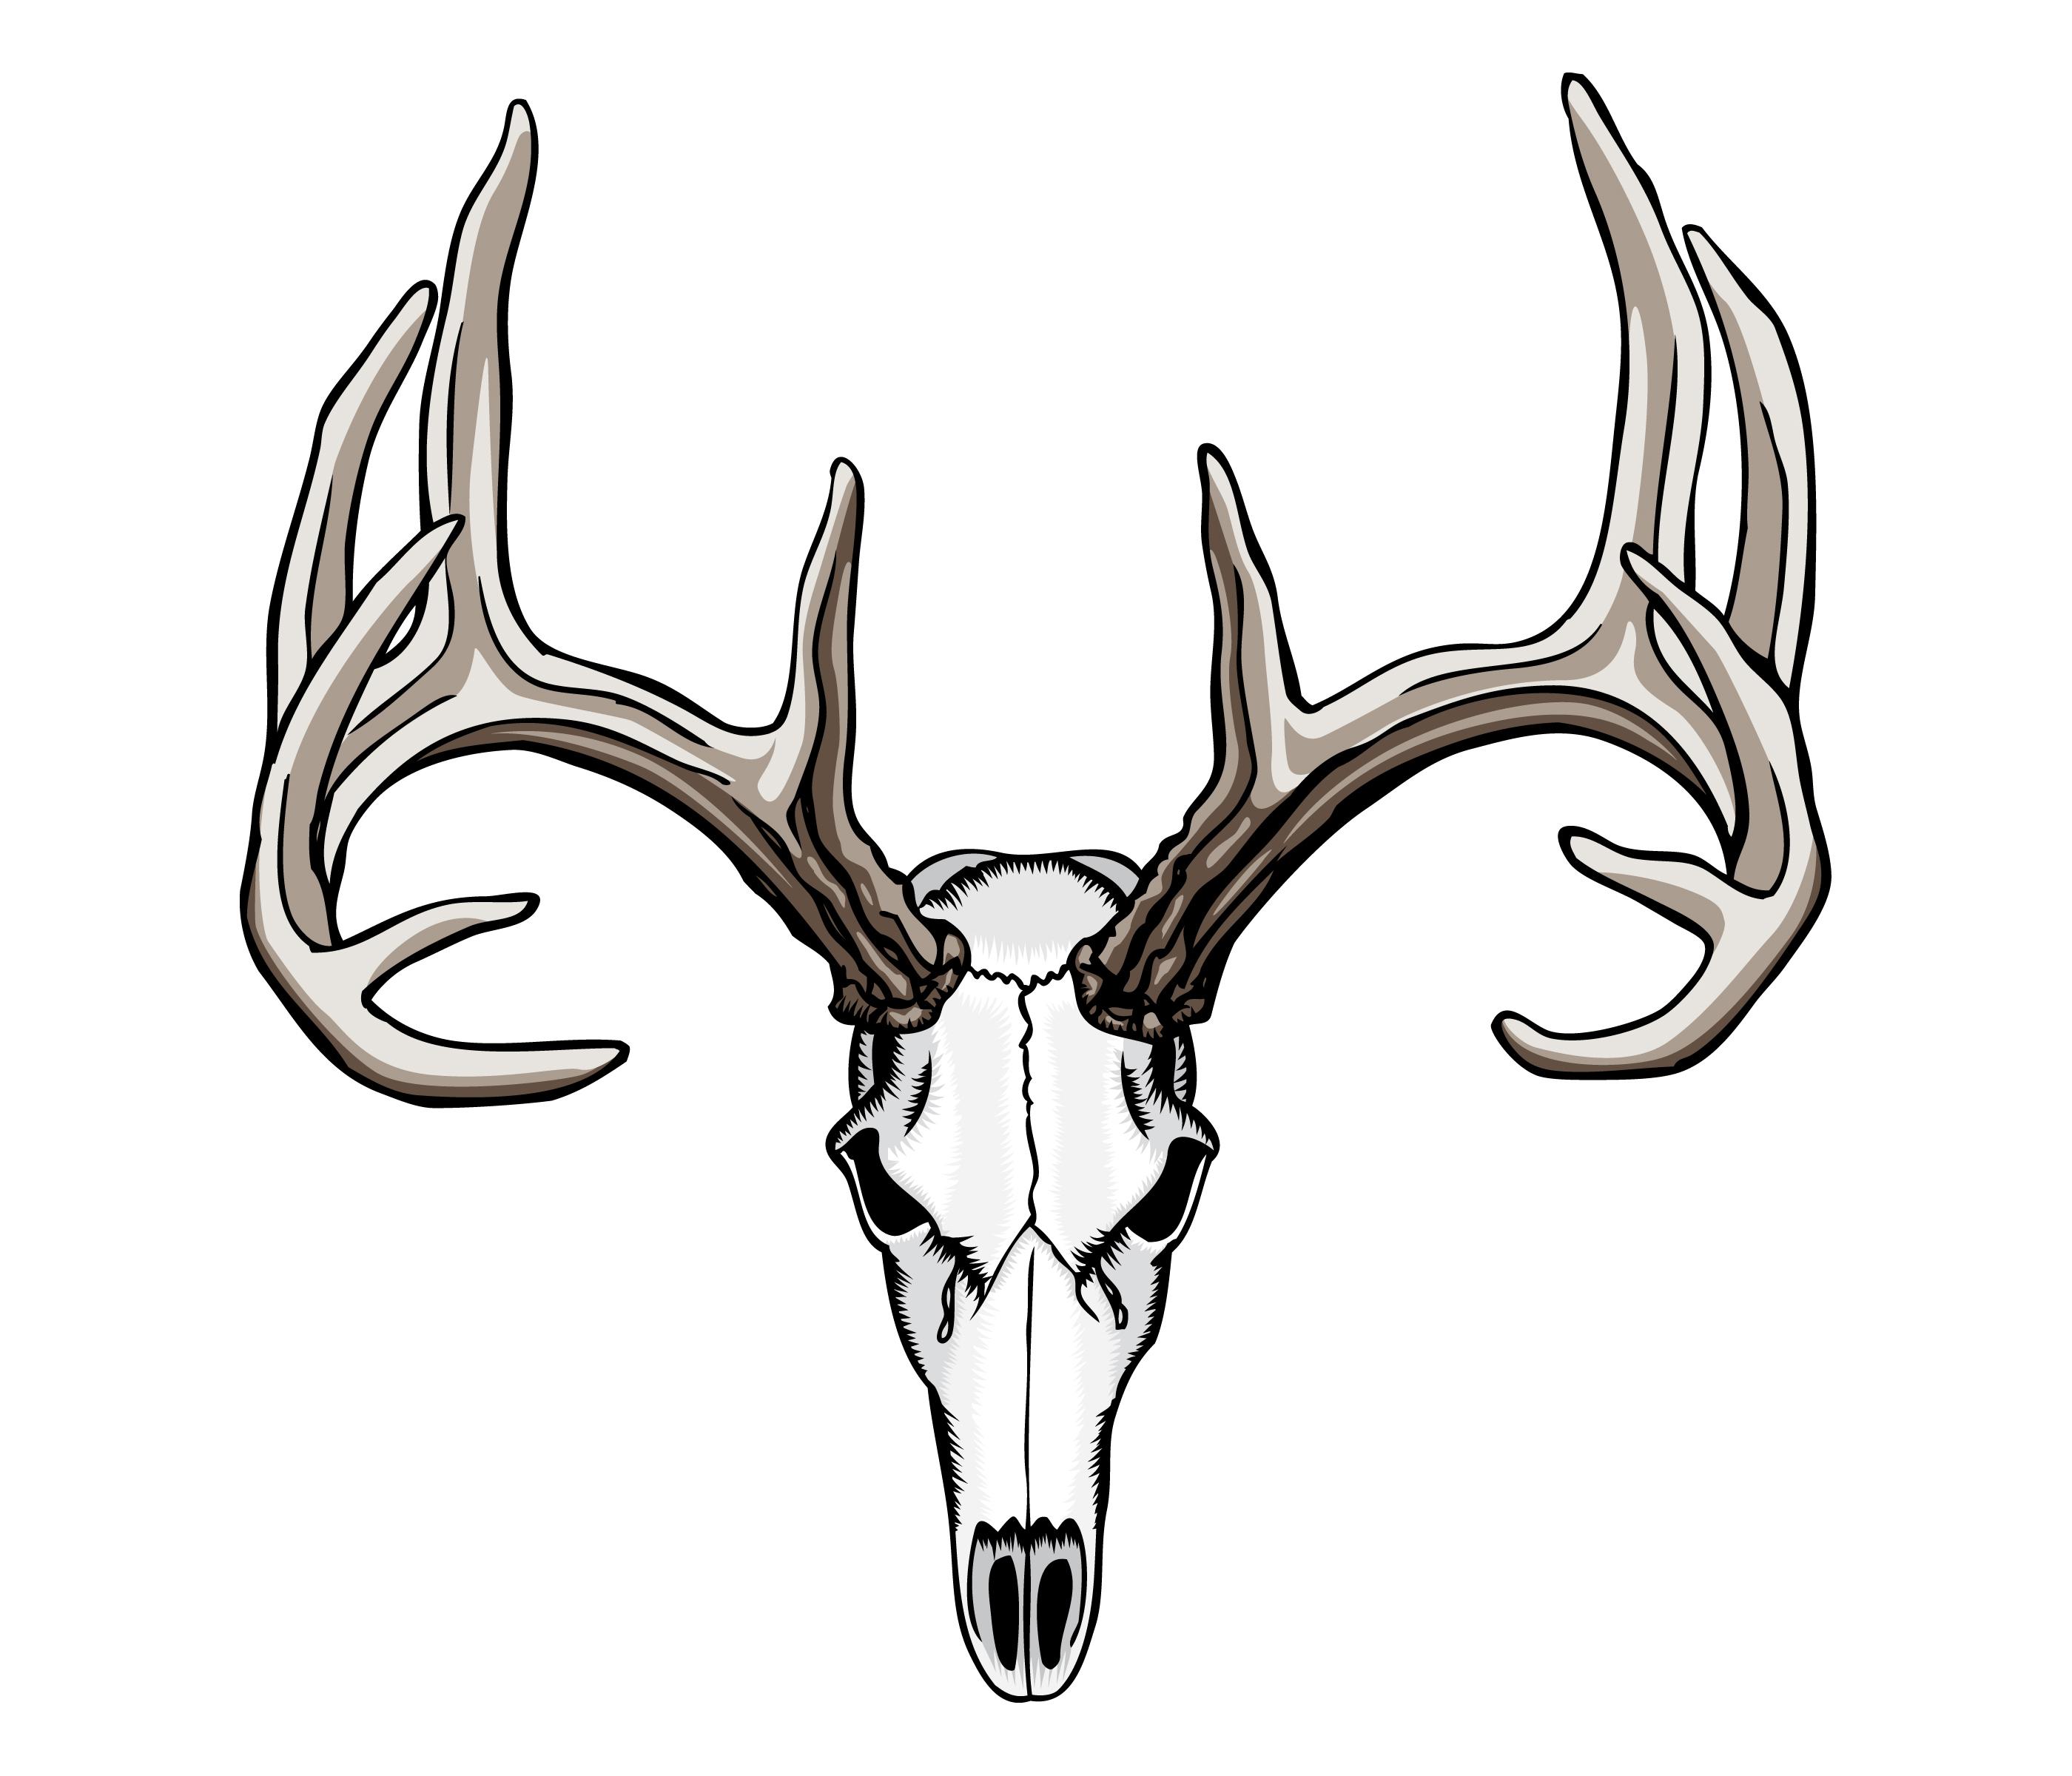 Deer Skull Silhouette at GetDrawings.com.